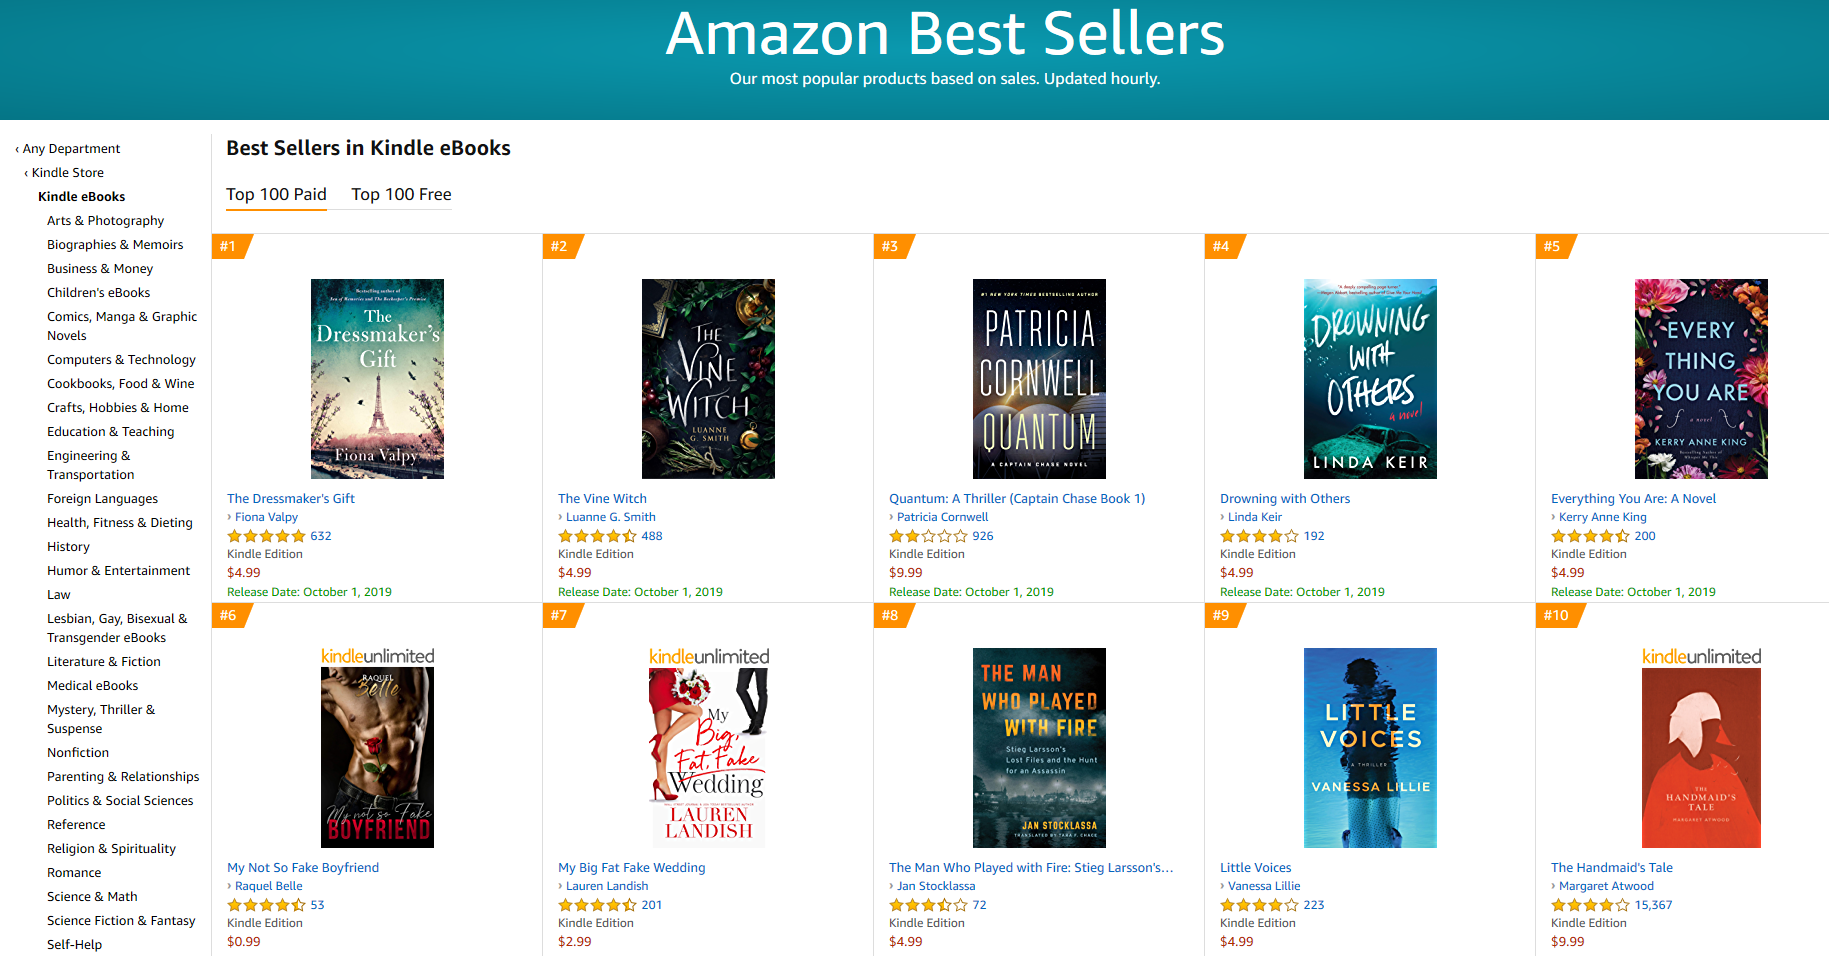 amazon best sellers in kindle ebooks